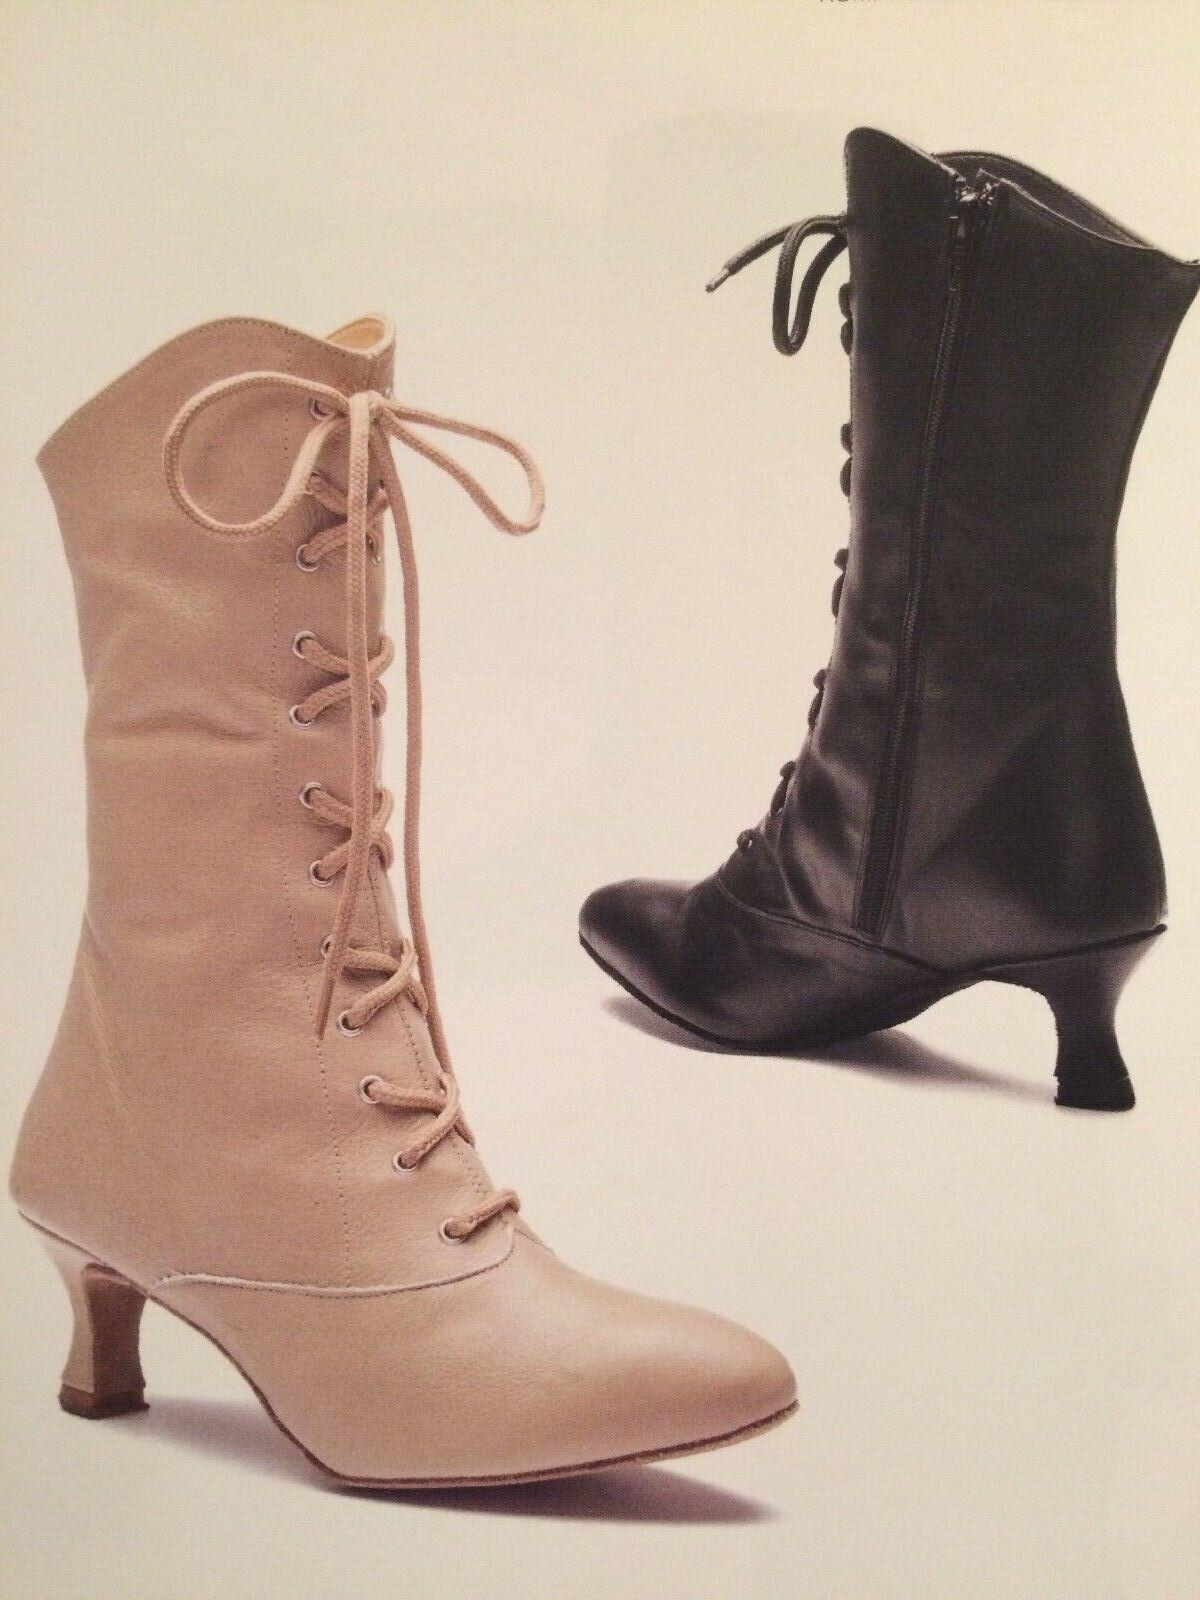 Rumpf Can Can Stiefel 2316 Tanz Tanz Tanz Show Schuh Bühne Stieflette Stiefel Chromledersohle e5f9a1